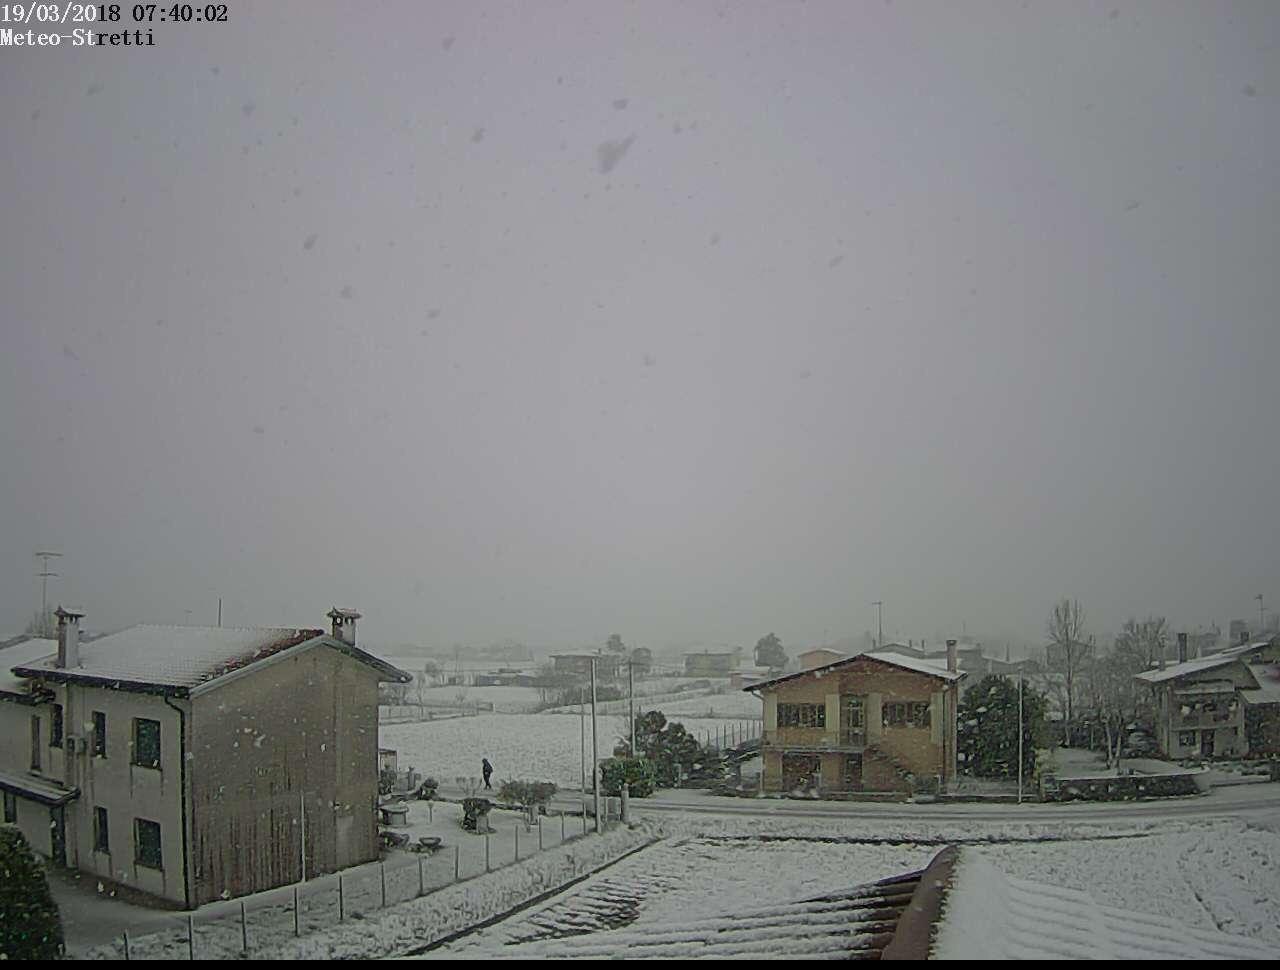 Nowcasting Friuli Venezia Giulia - Veneto Orientale PRIMAVERA 2018-img_5054.jpg